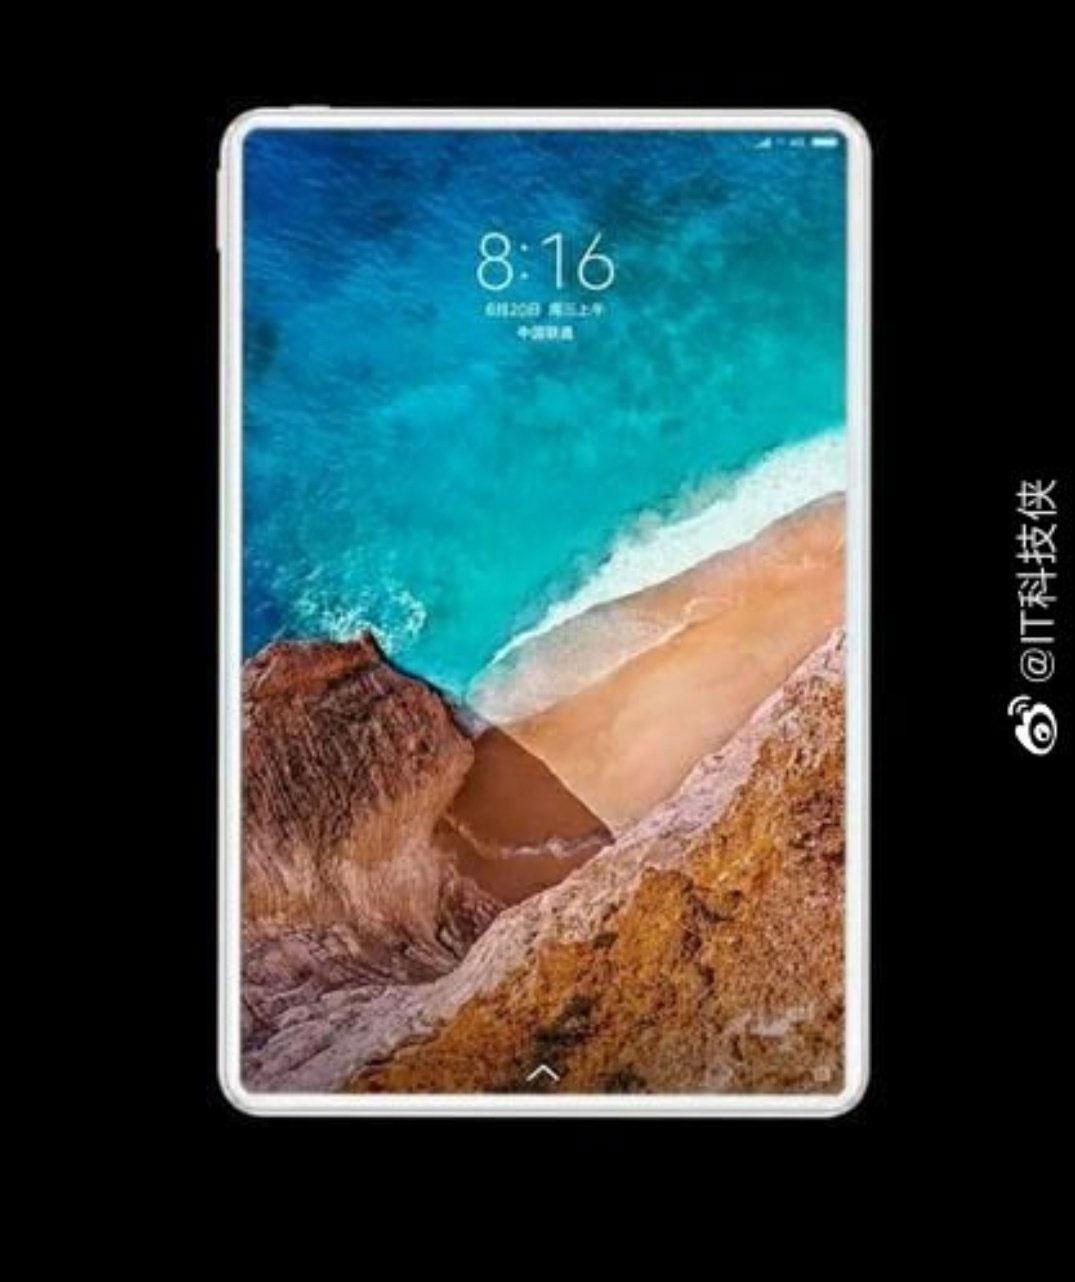 Xiaomi Mi Tablet 5 Images Leaked Online